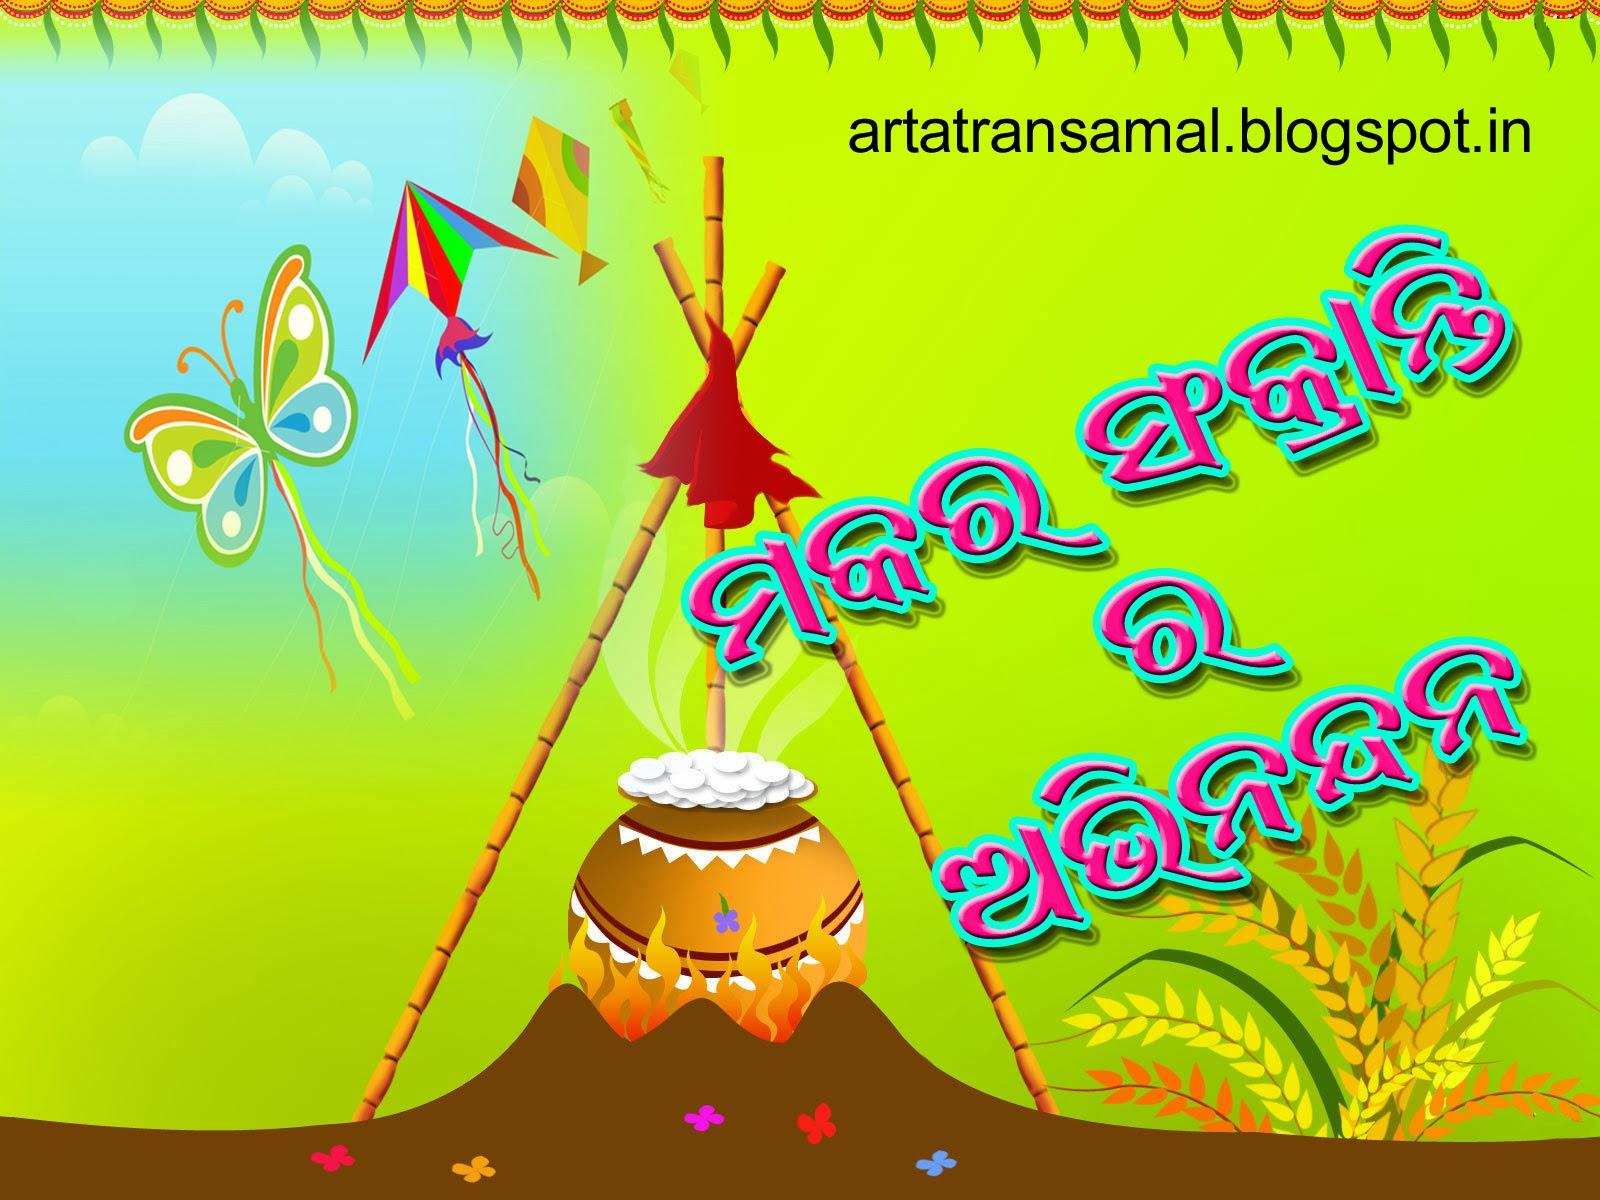 essay on makar sankranti in hindi Rajputana shayari rajputana shayari , rajputana status , rajputana quotes , rajputana shayari photos.